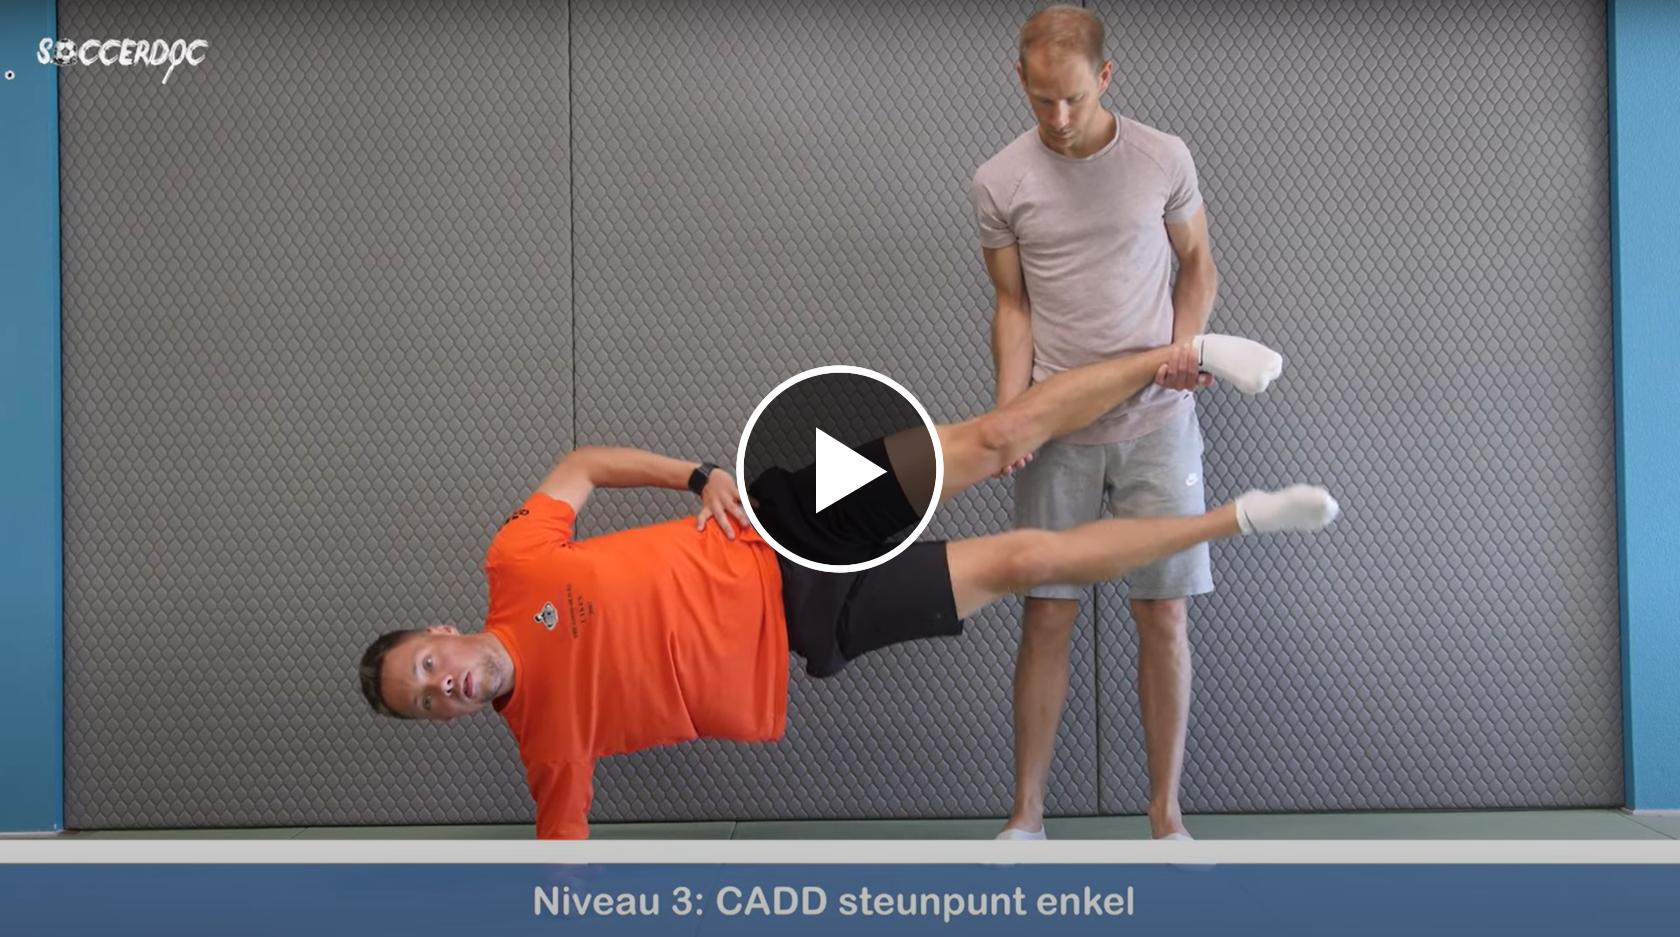 soccerdoc-adductor-strengthening-programme